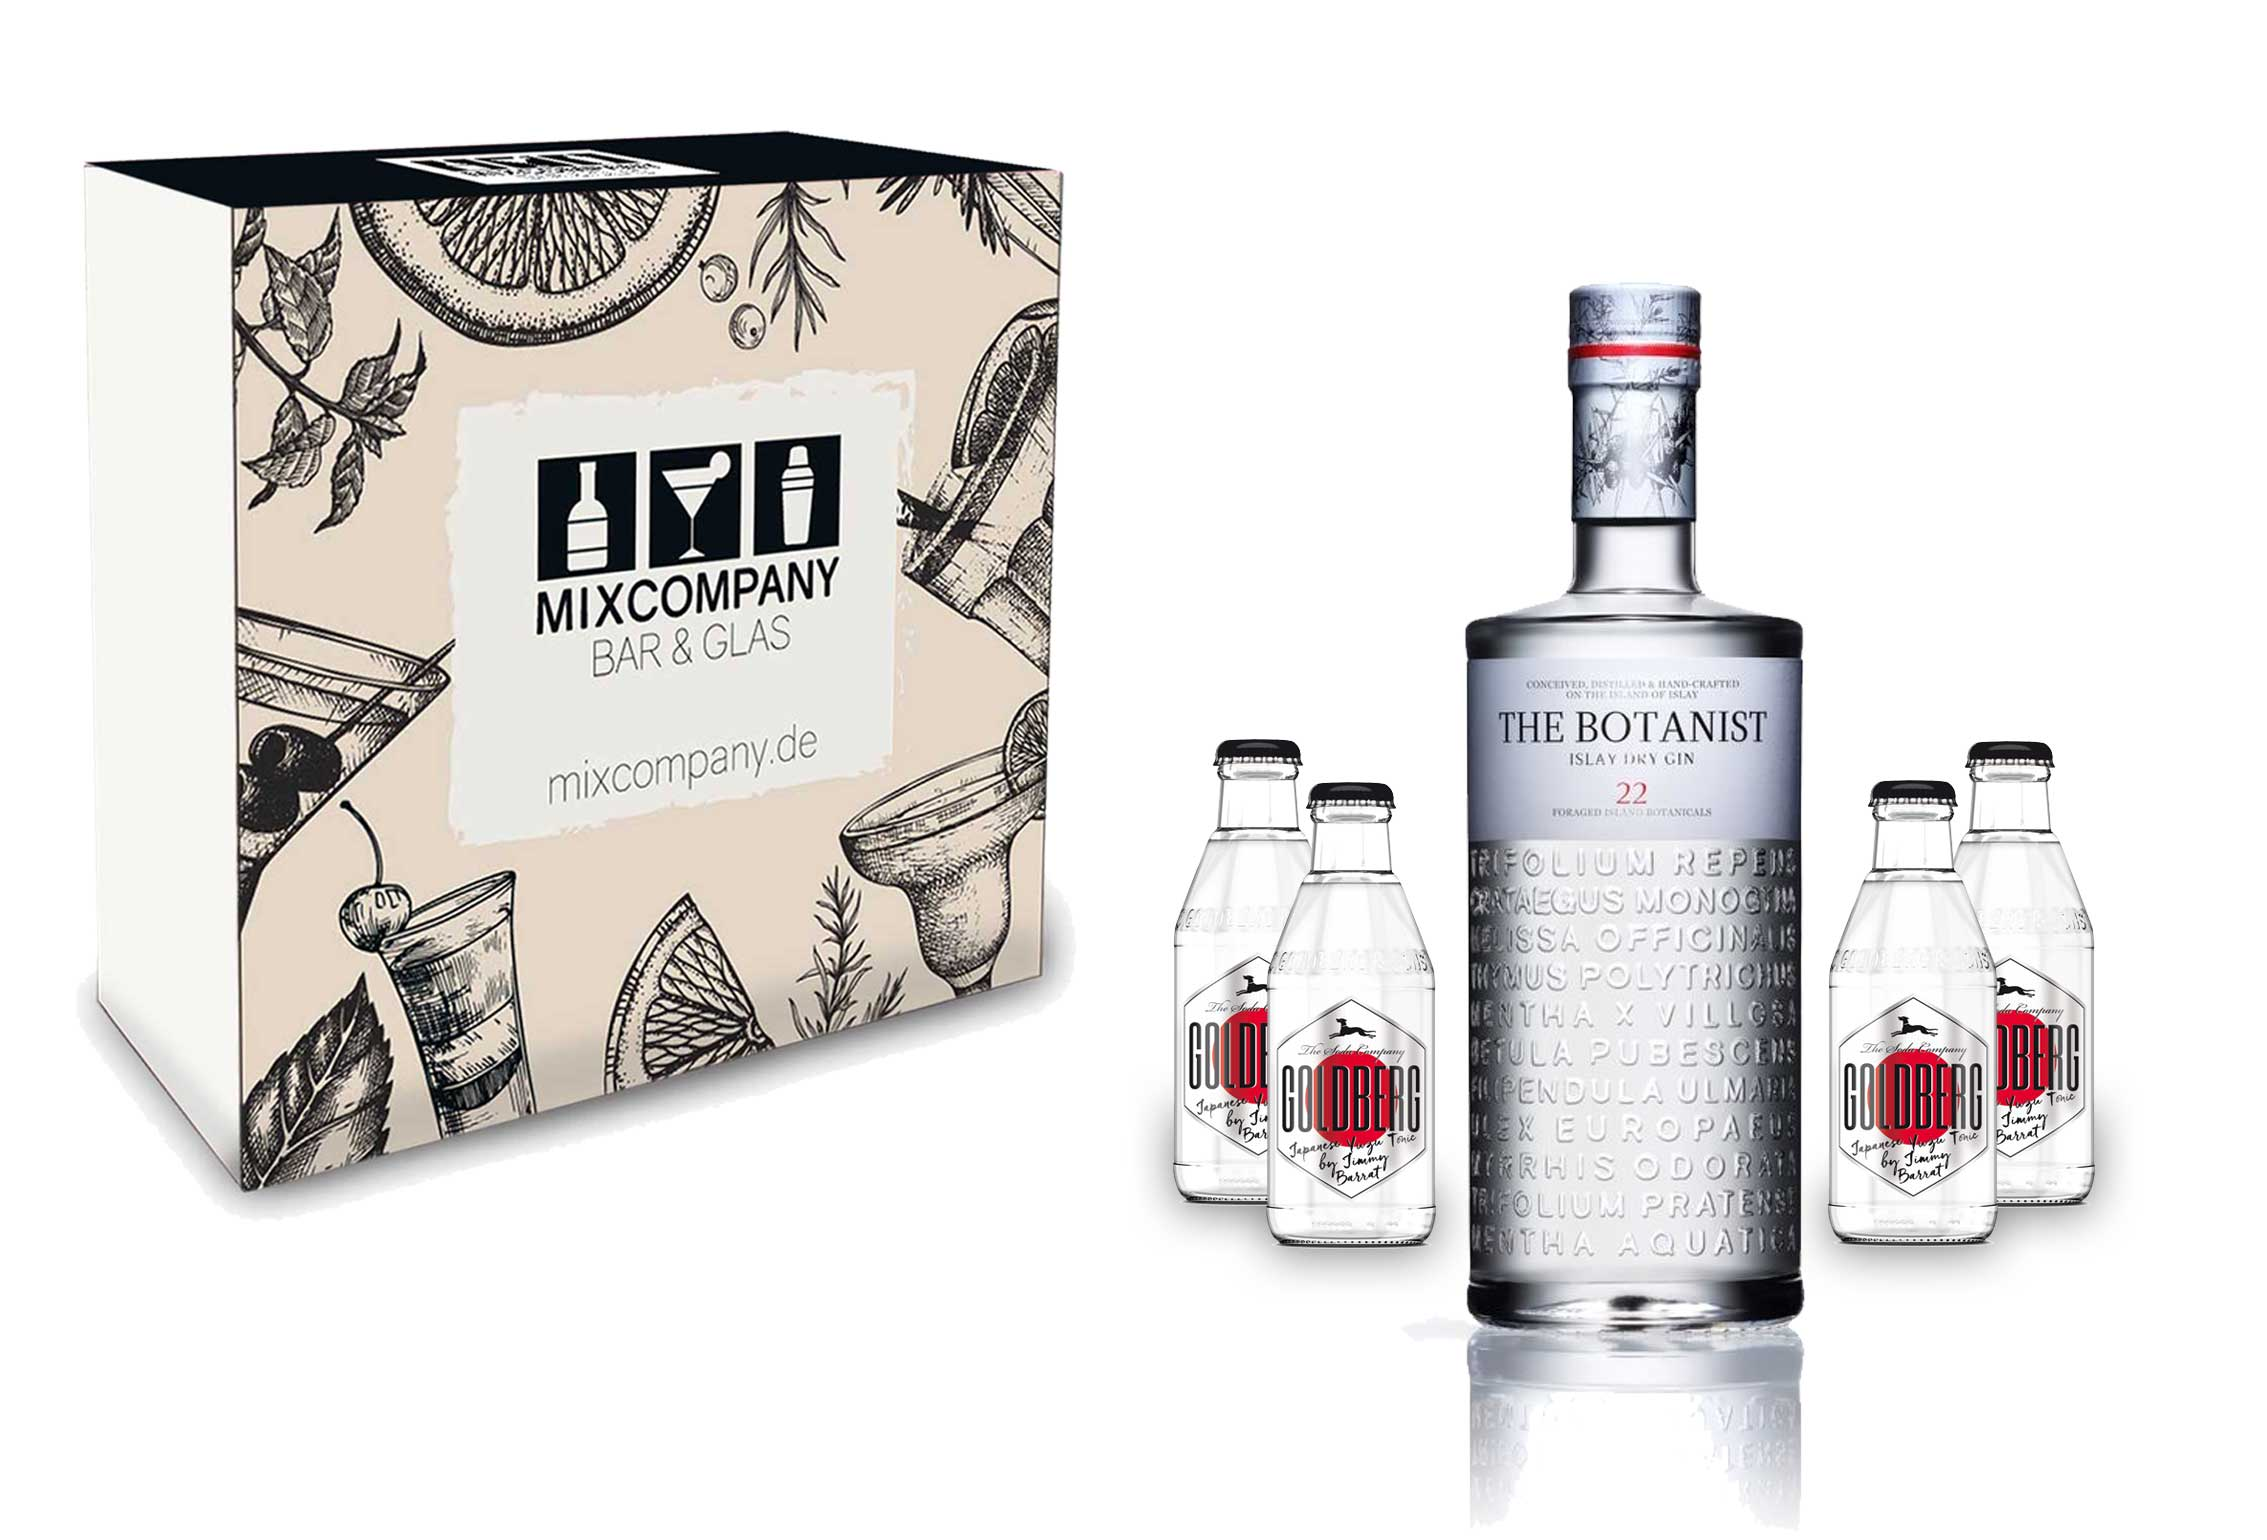 Gin Tonic Set Giftbox Geschenkset - The Botanist Islay Dry Gin 0,7l 700ml (46% Vol) + 4x Goldberg Japanese Yuzu Tonic Water 200ml inkl. Pfand MEHRWEG -[Enthält Sulfite]